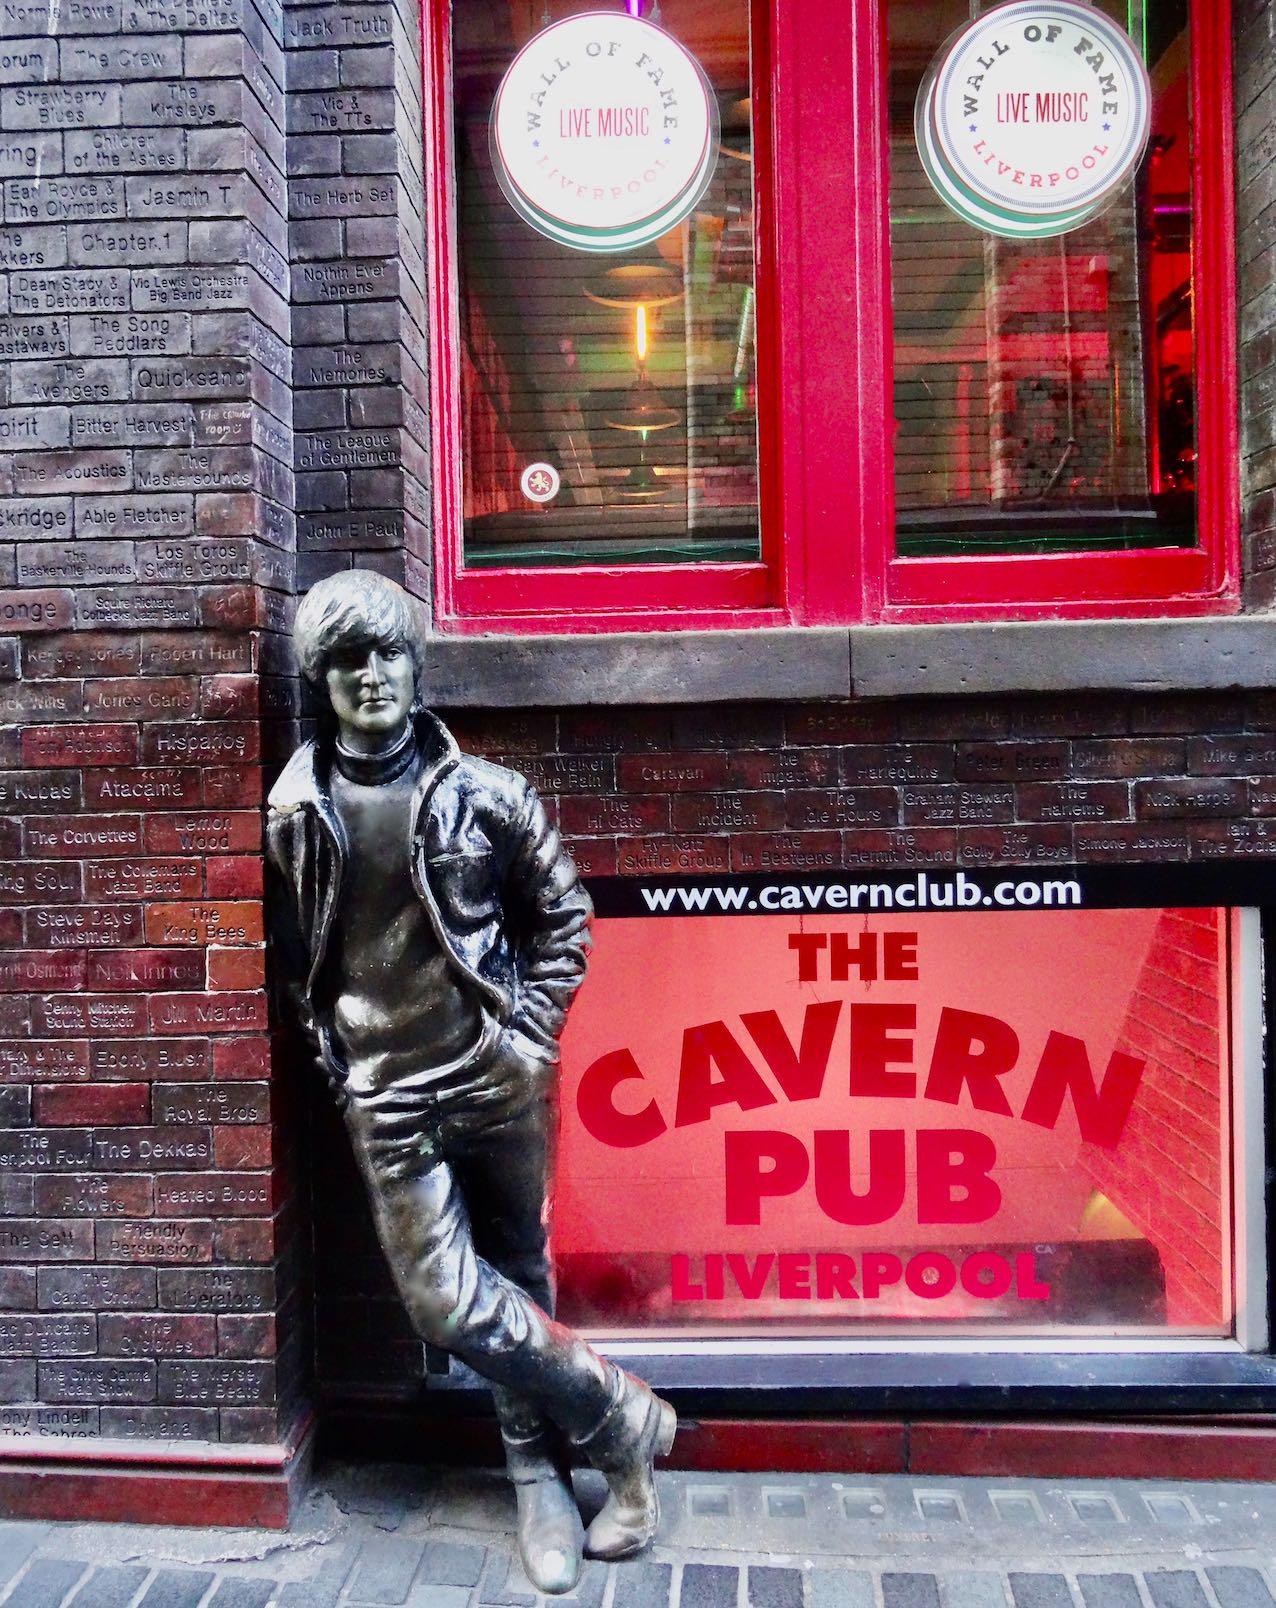 The Cavern Pub in Liverpool.